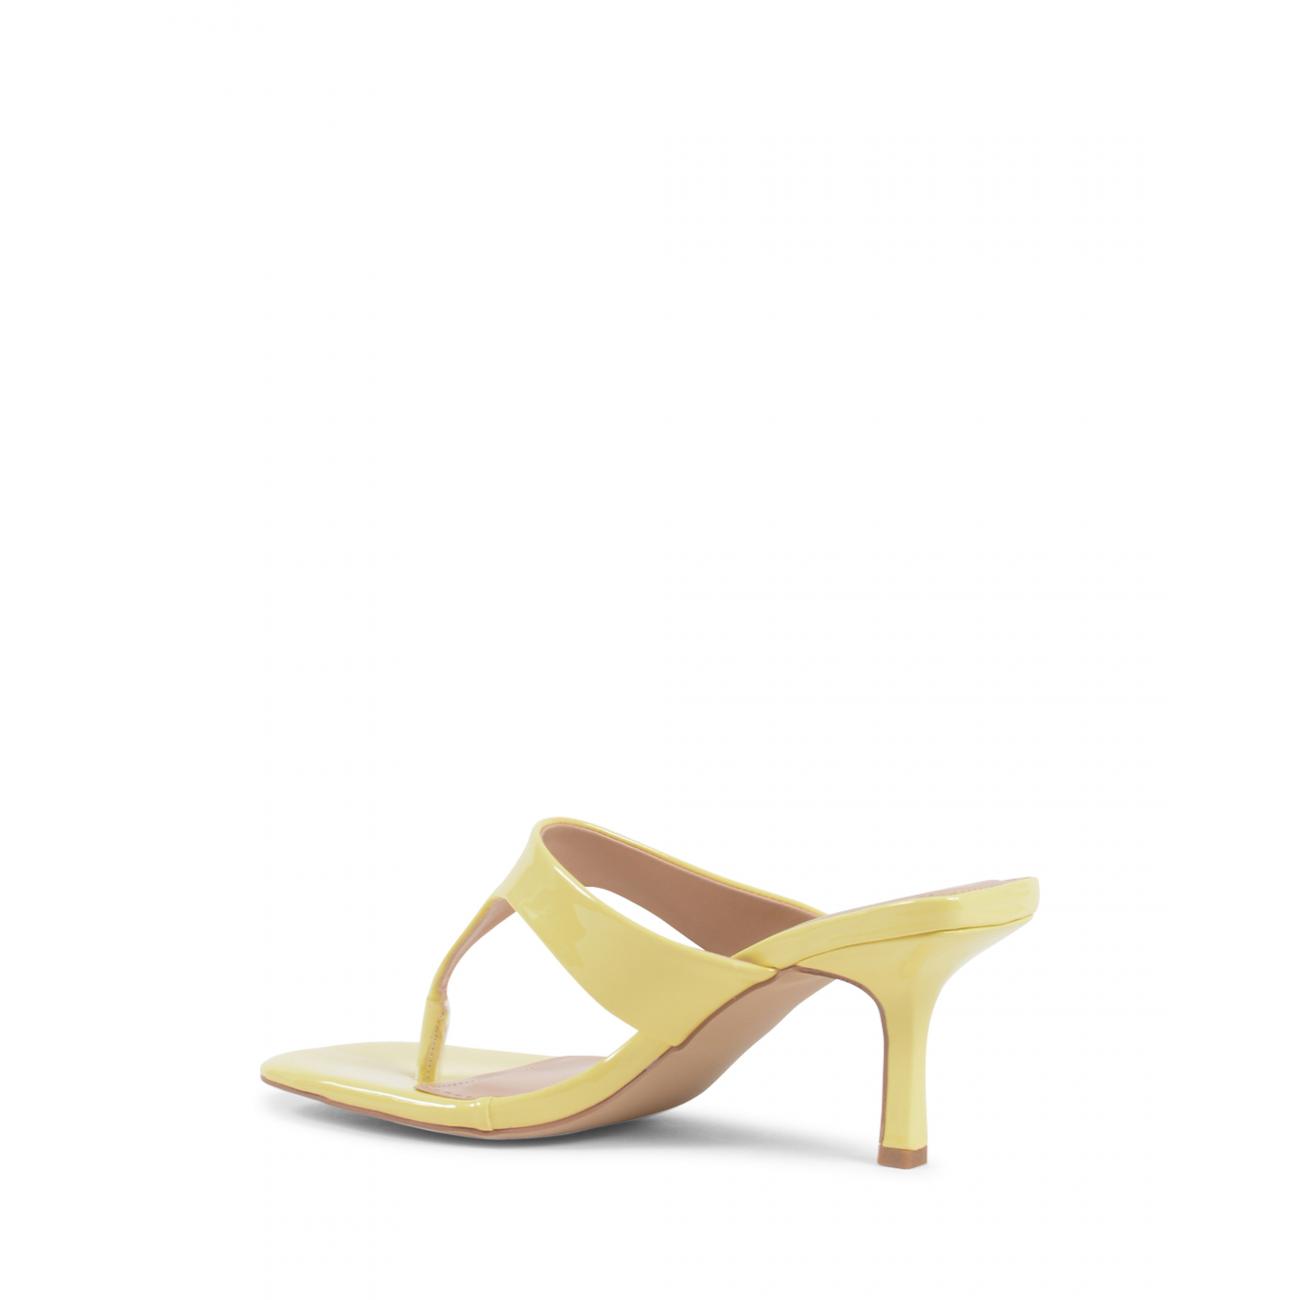 19V69 Italia Women's Mule Sandal Yellow V81819 YELLOW